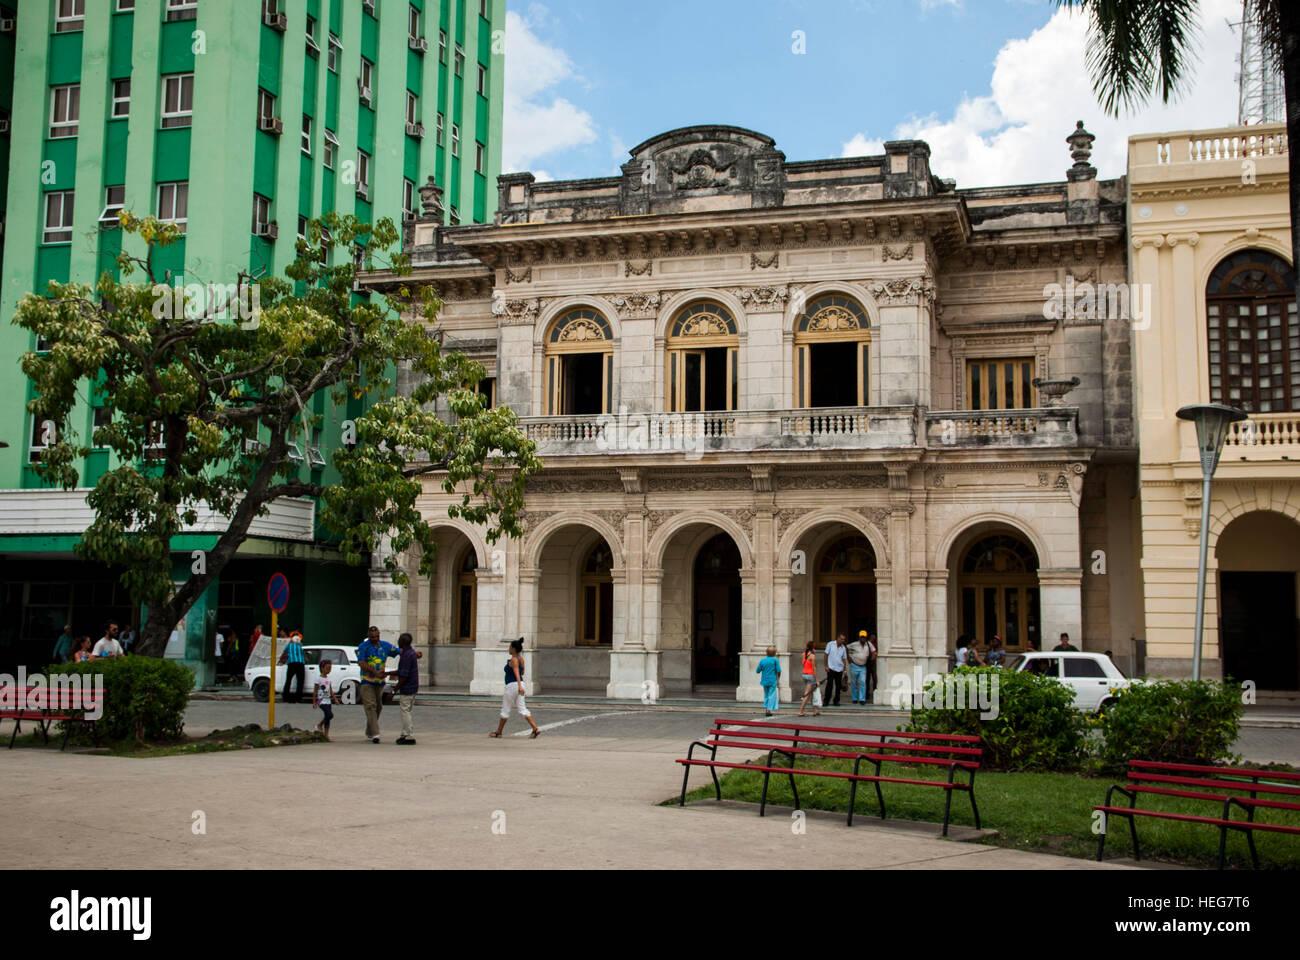 Haus im Kolonialstil am Parque Vidal, Santa Clara, Kuba Stock Photo